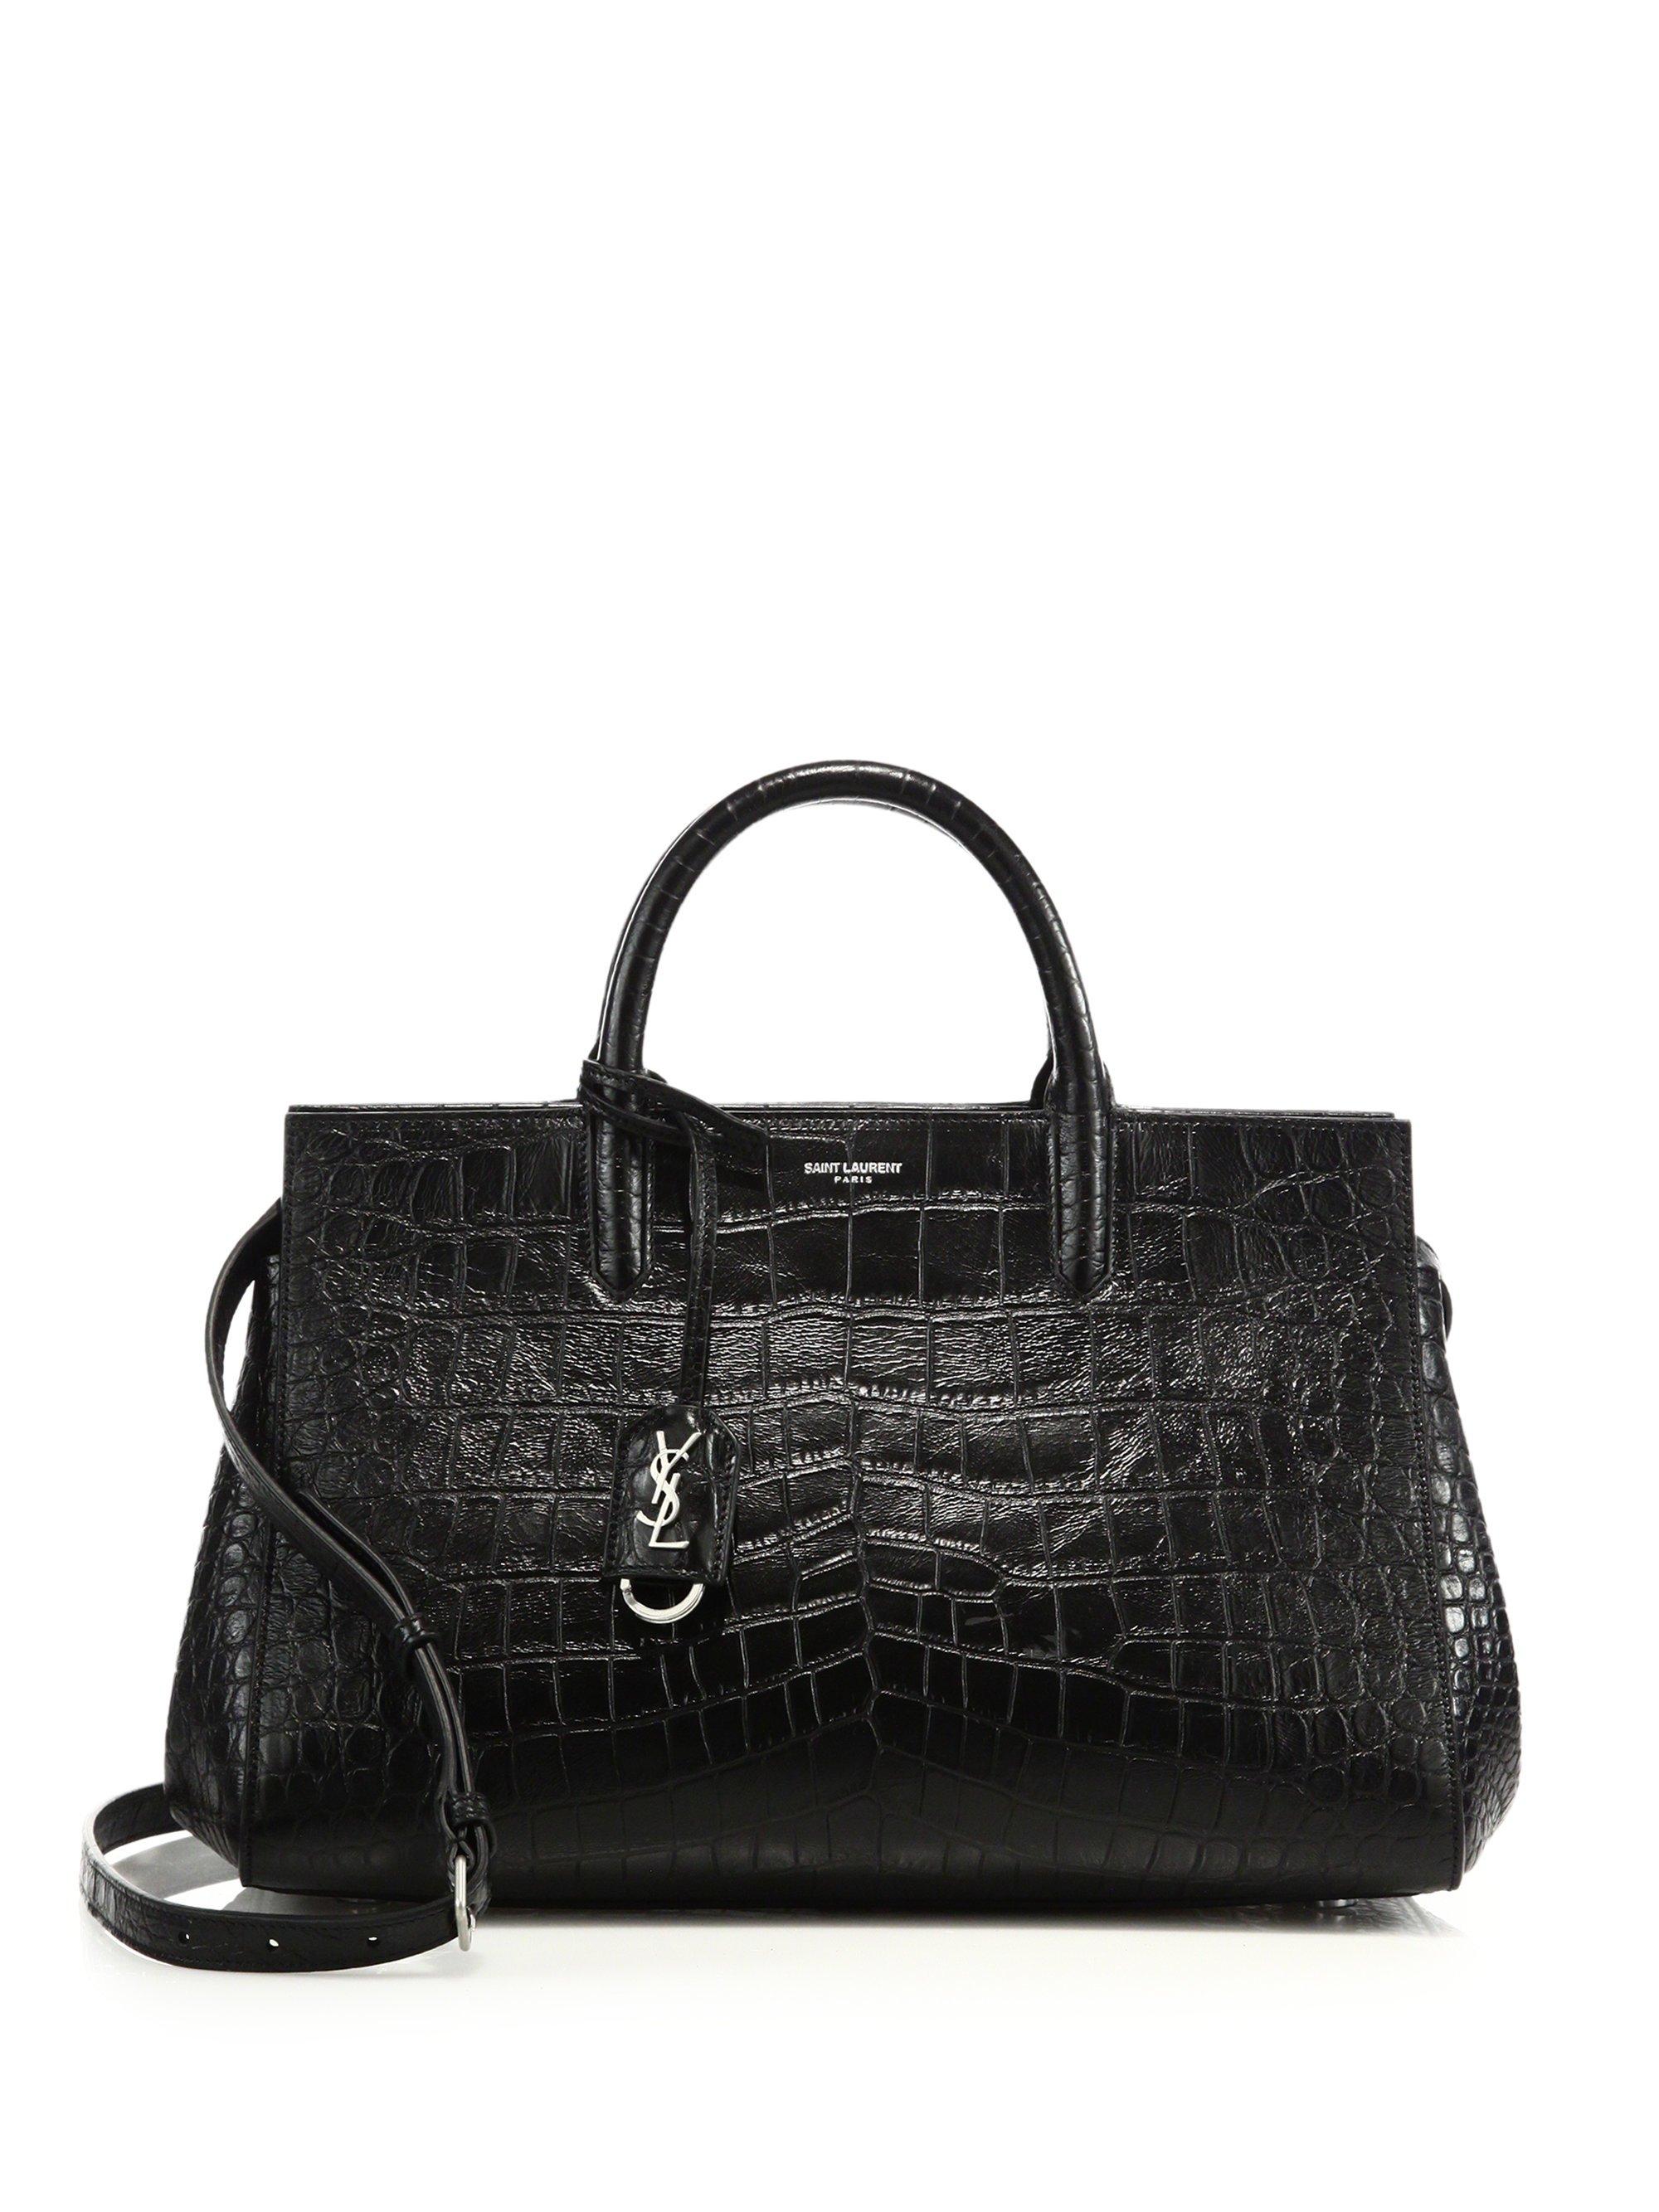 ysl diaper bag - Saint laurent Monogram Cabas Small Crocodile-embossed Leather ...